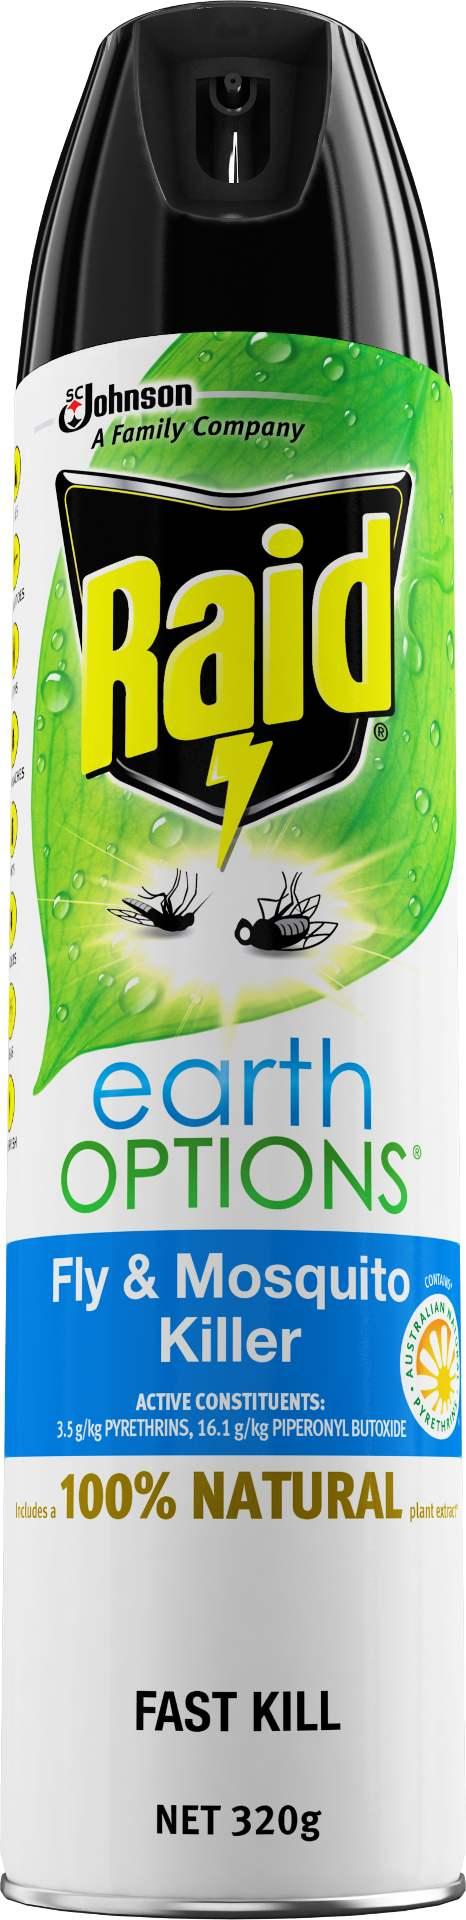 Raid bug spray review